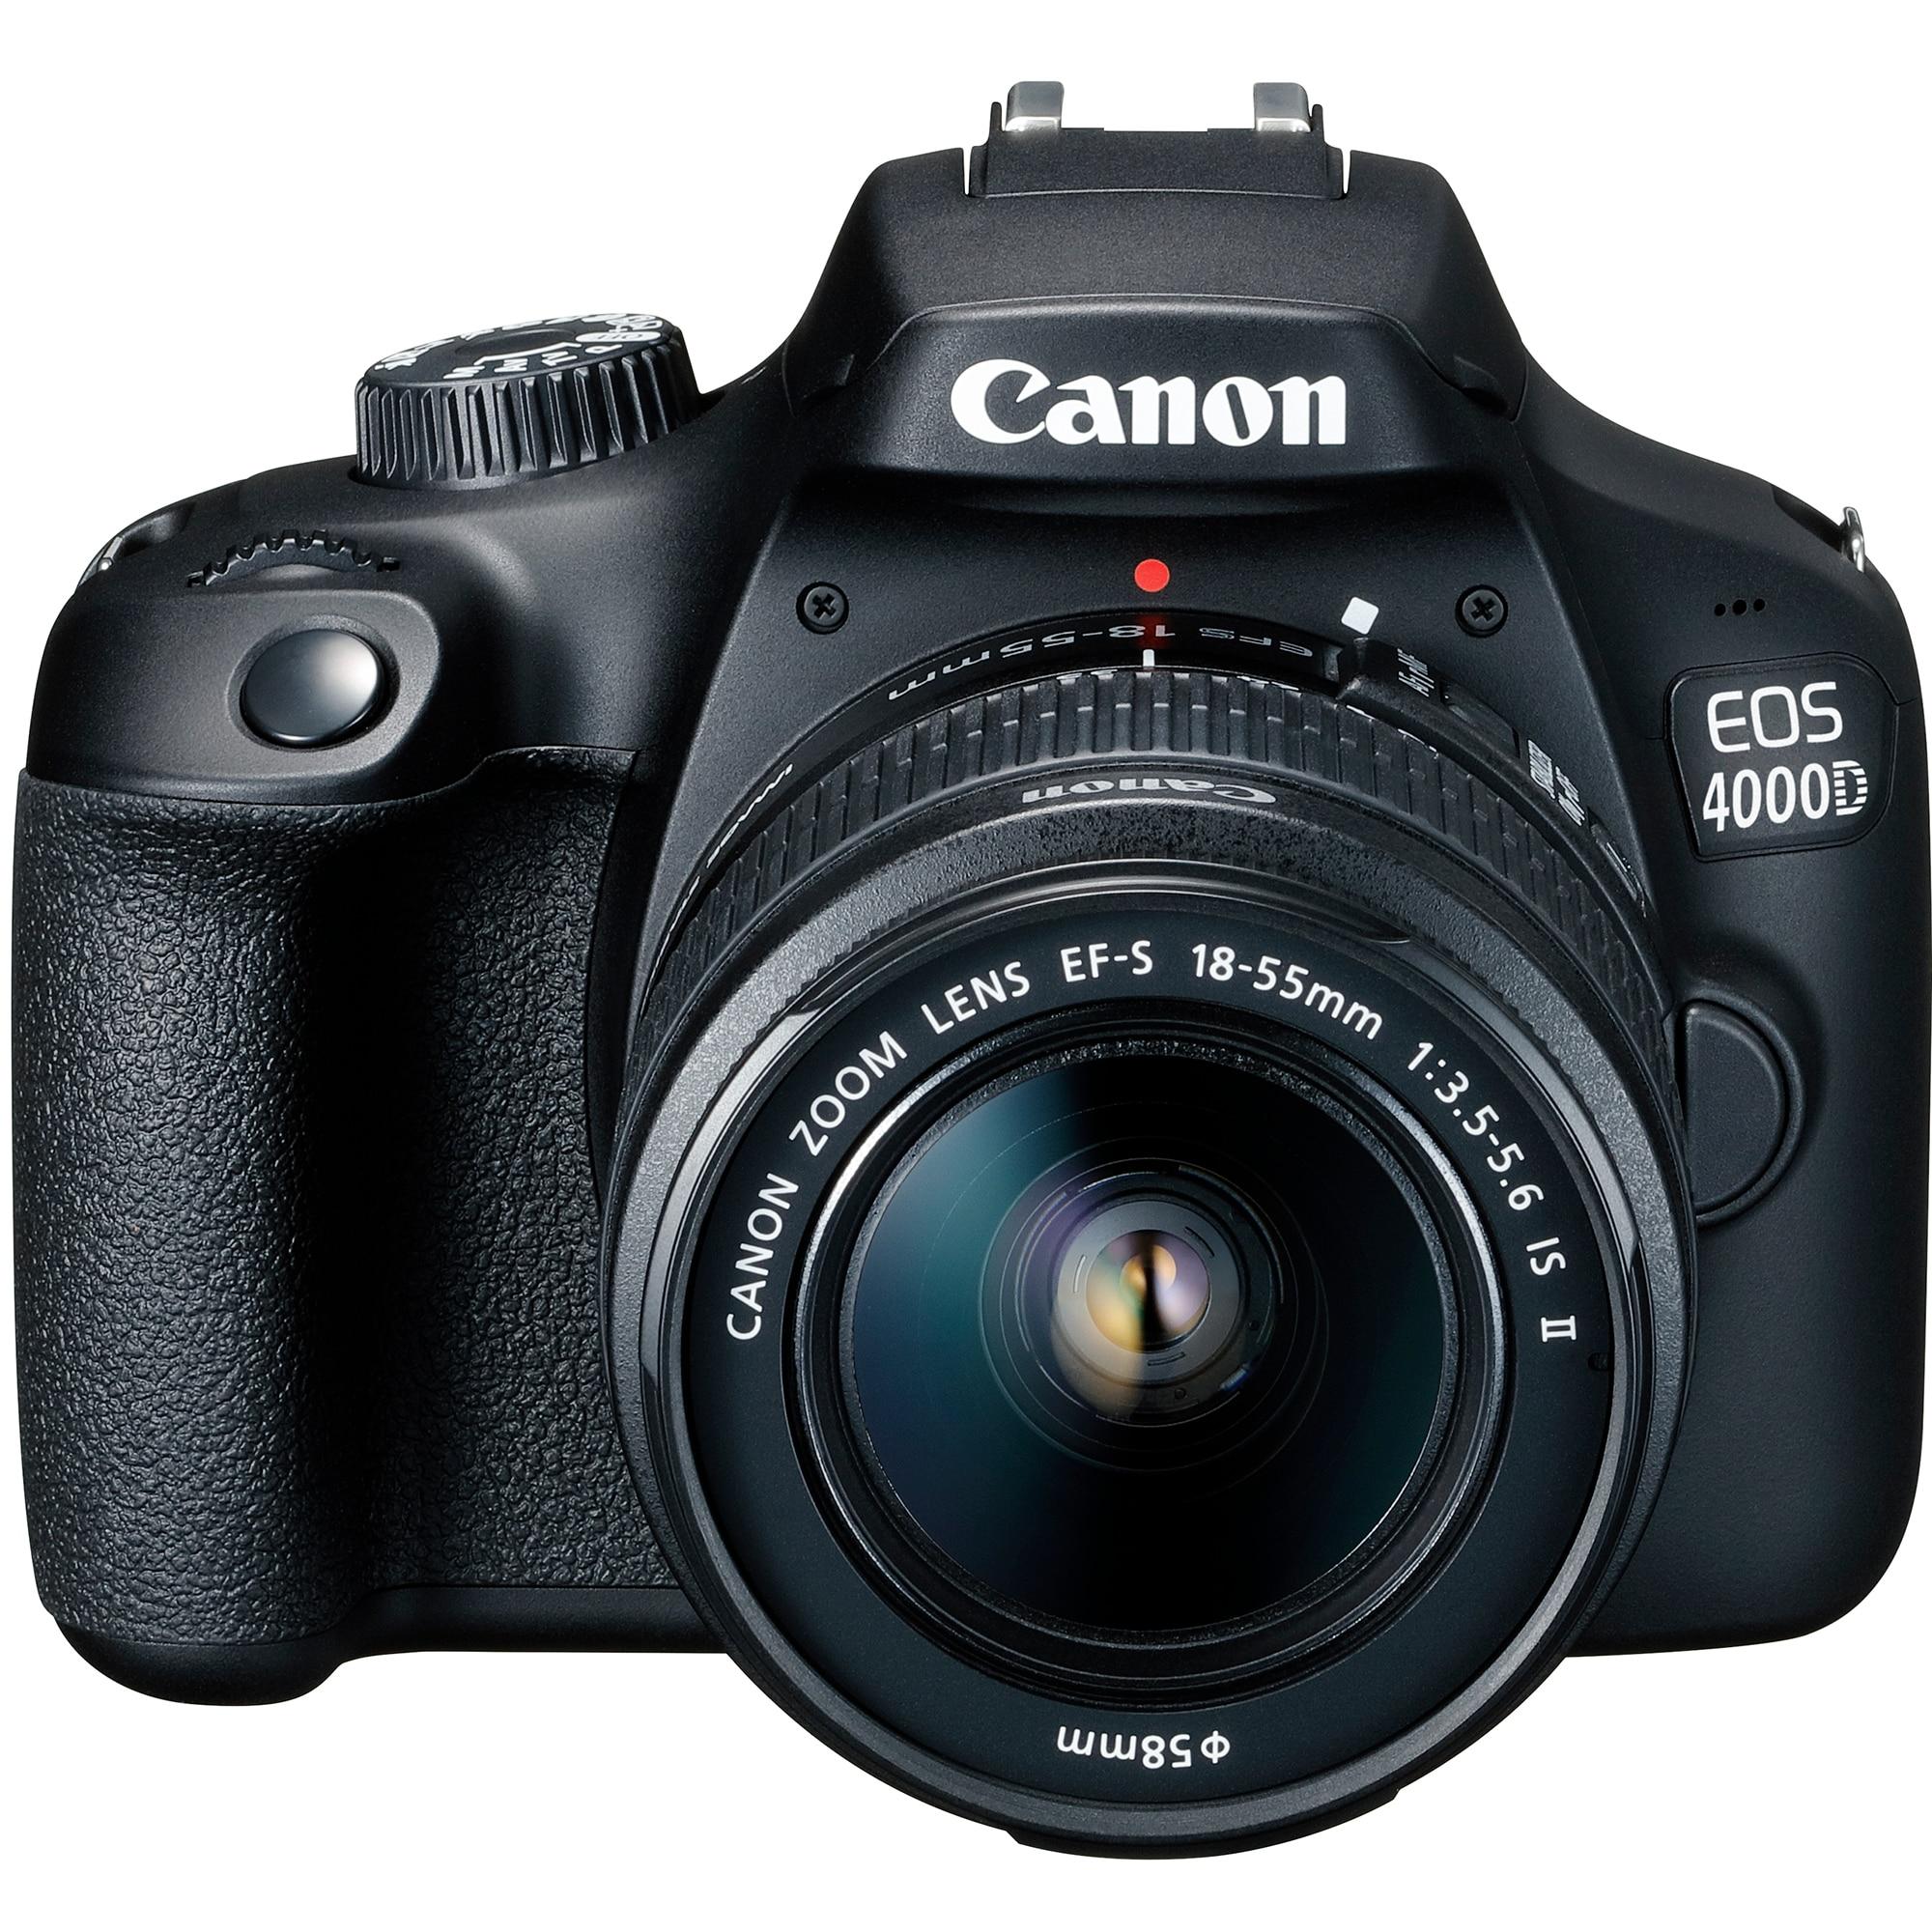 Fotografie Aparat foto DSLR Canon EOS 4000D,18.0 MP, Negru + Obiectiv EF-S 18-55mm F/3.5-5.6 III Negru